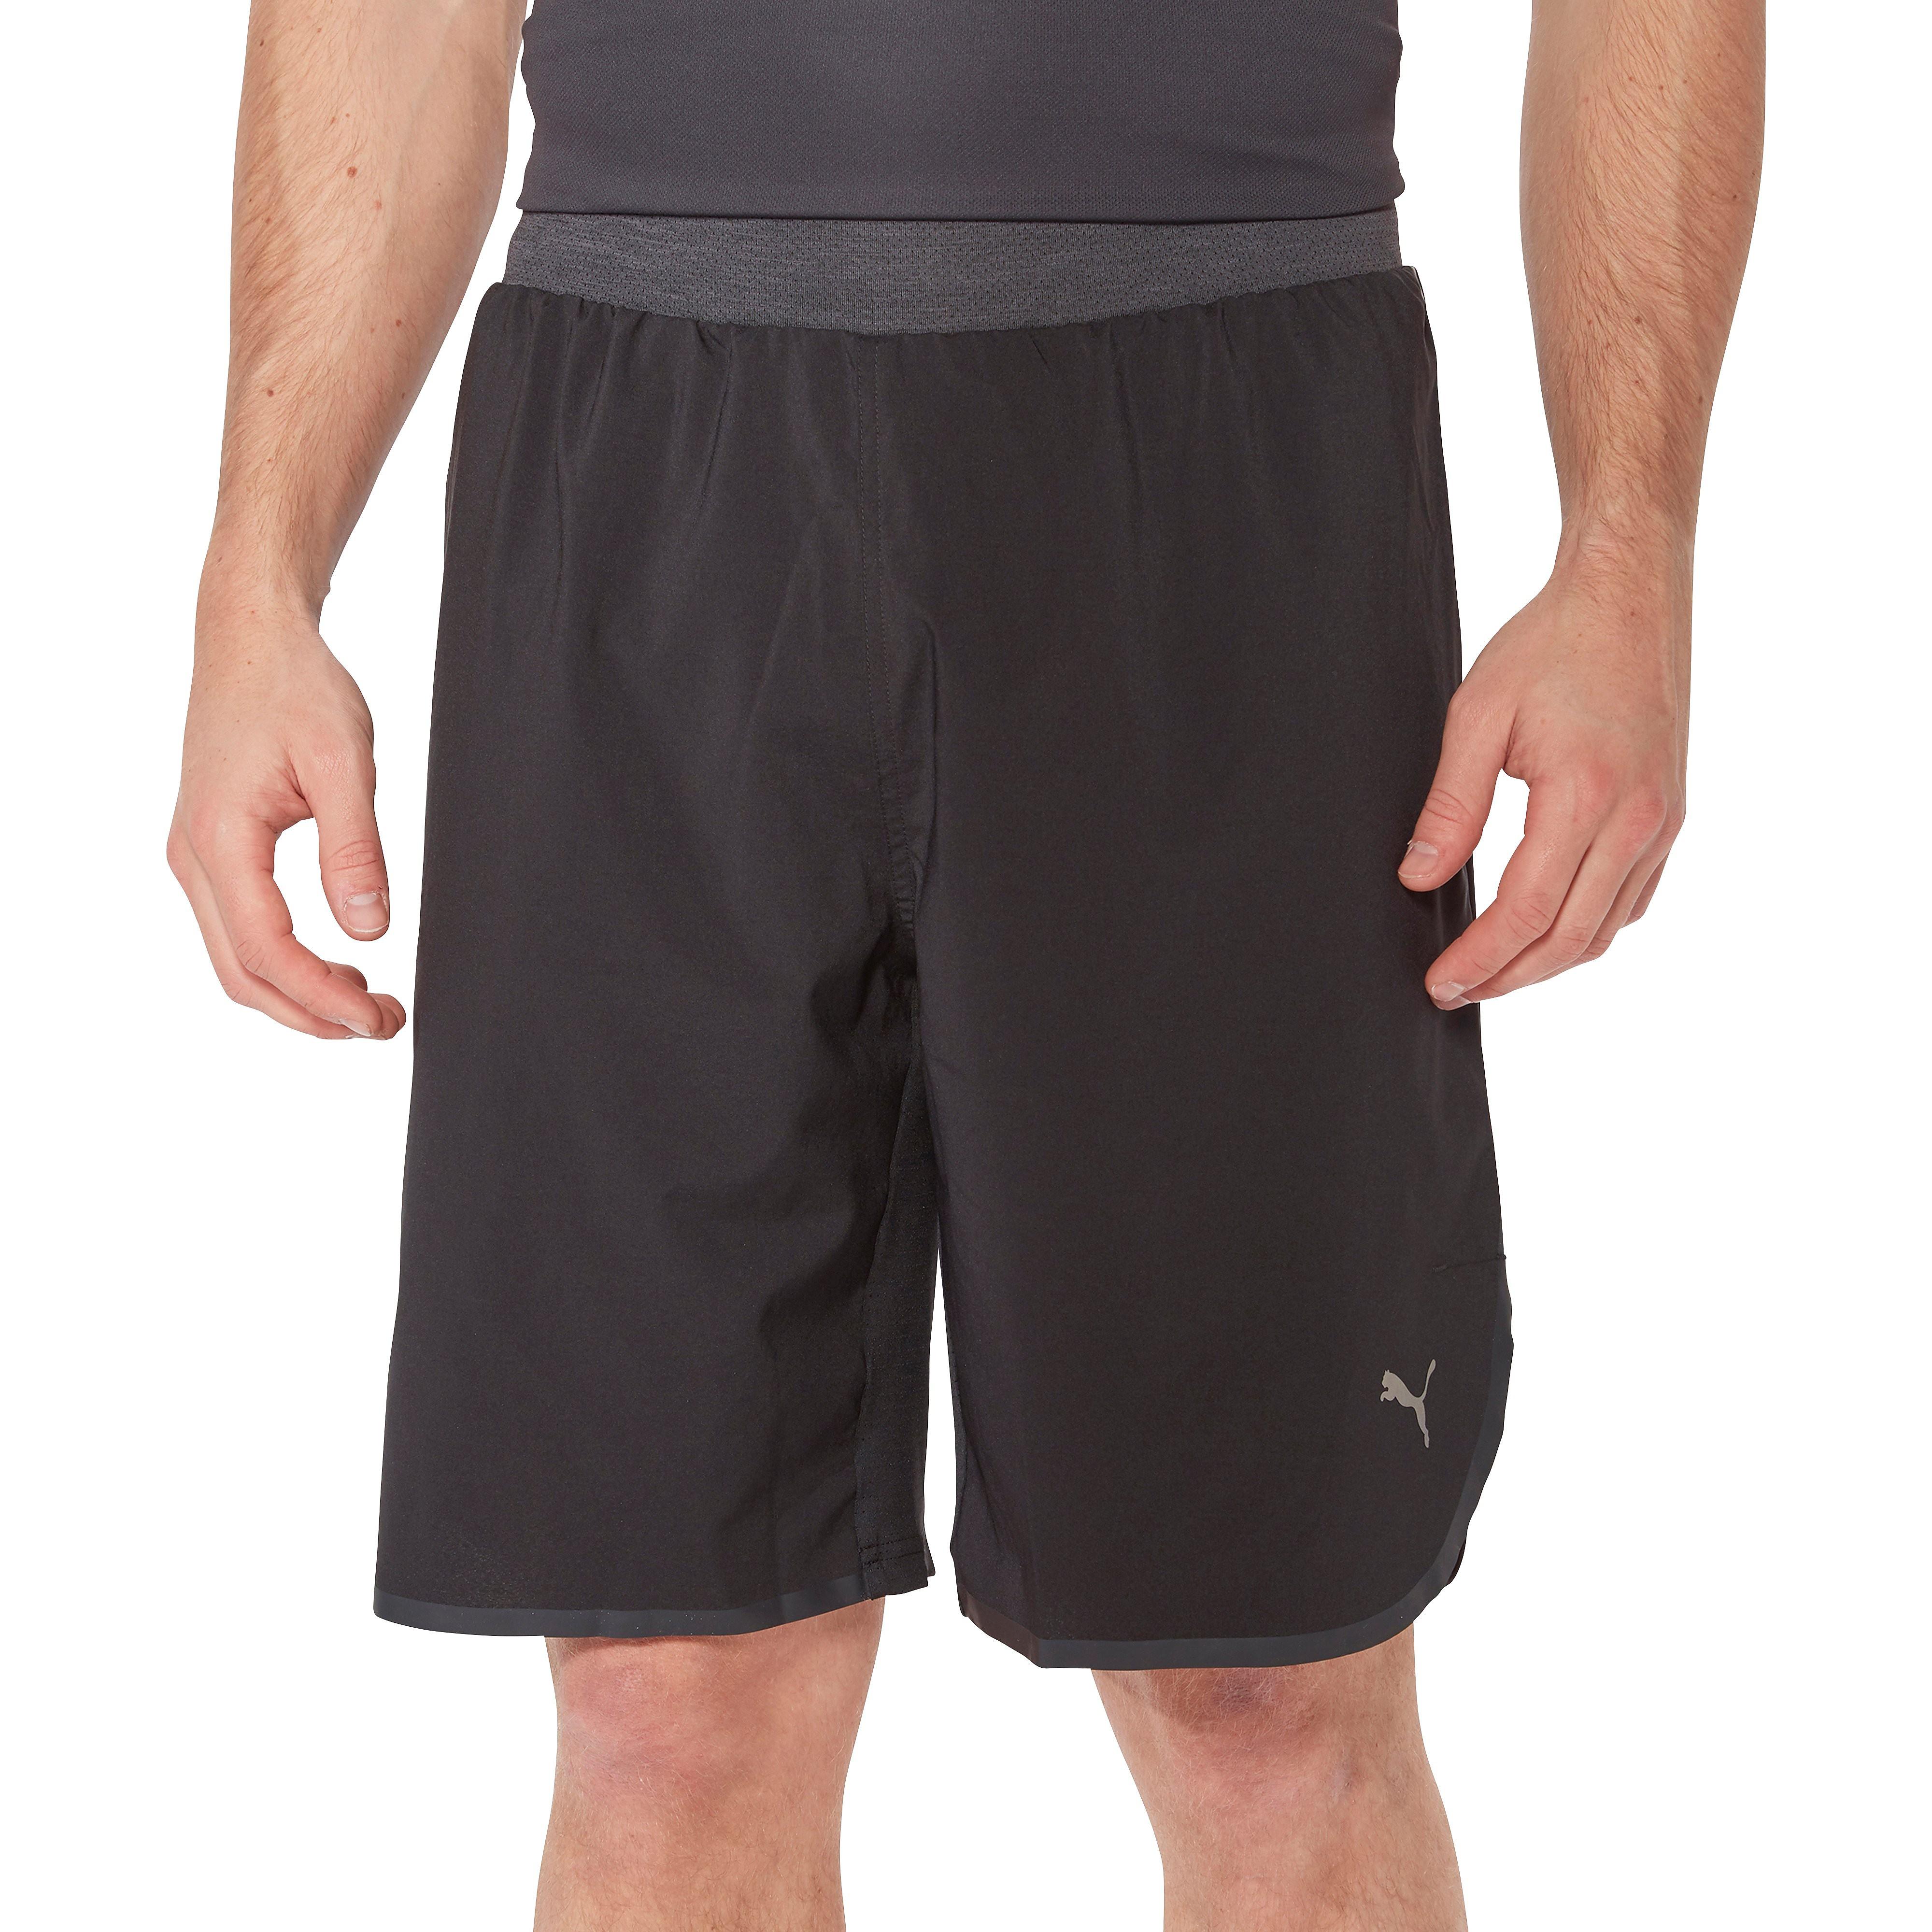 PUMA Energy Laser Men's Training Shorts